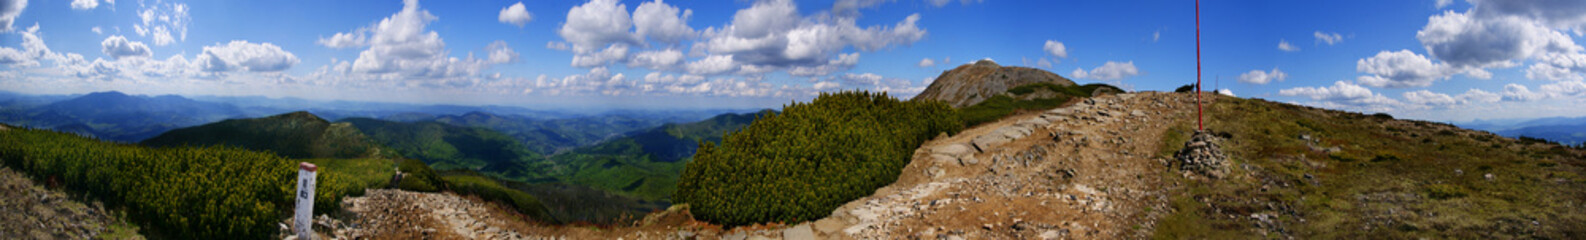 Góry, Mountains, Babia Góra